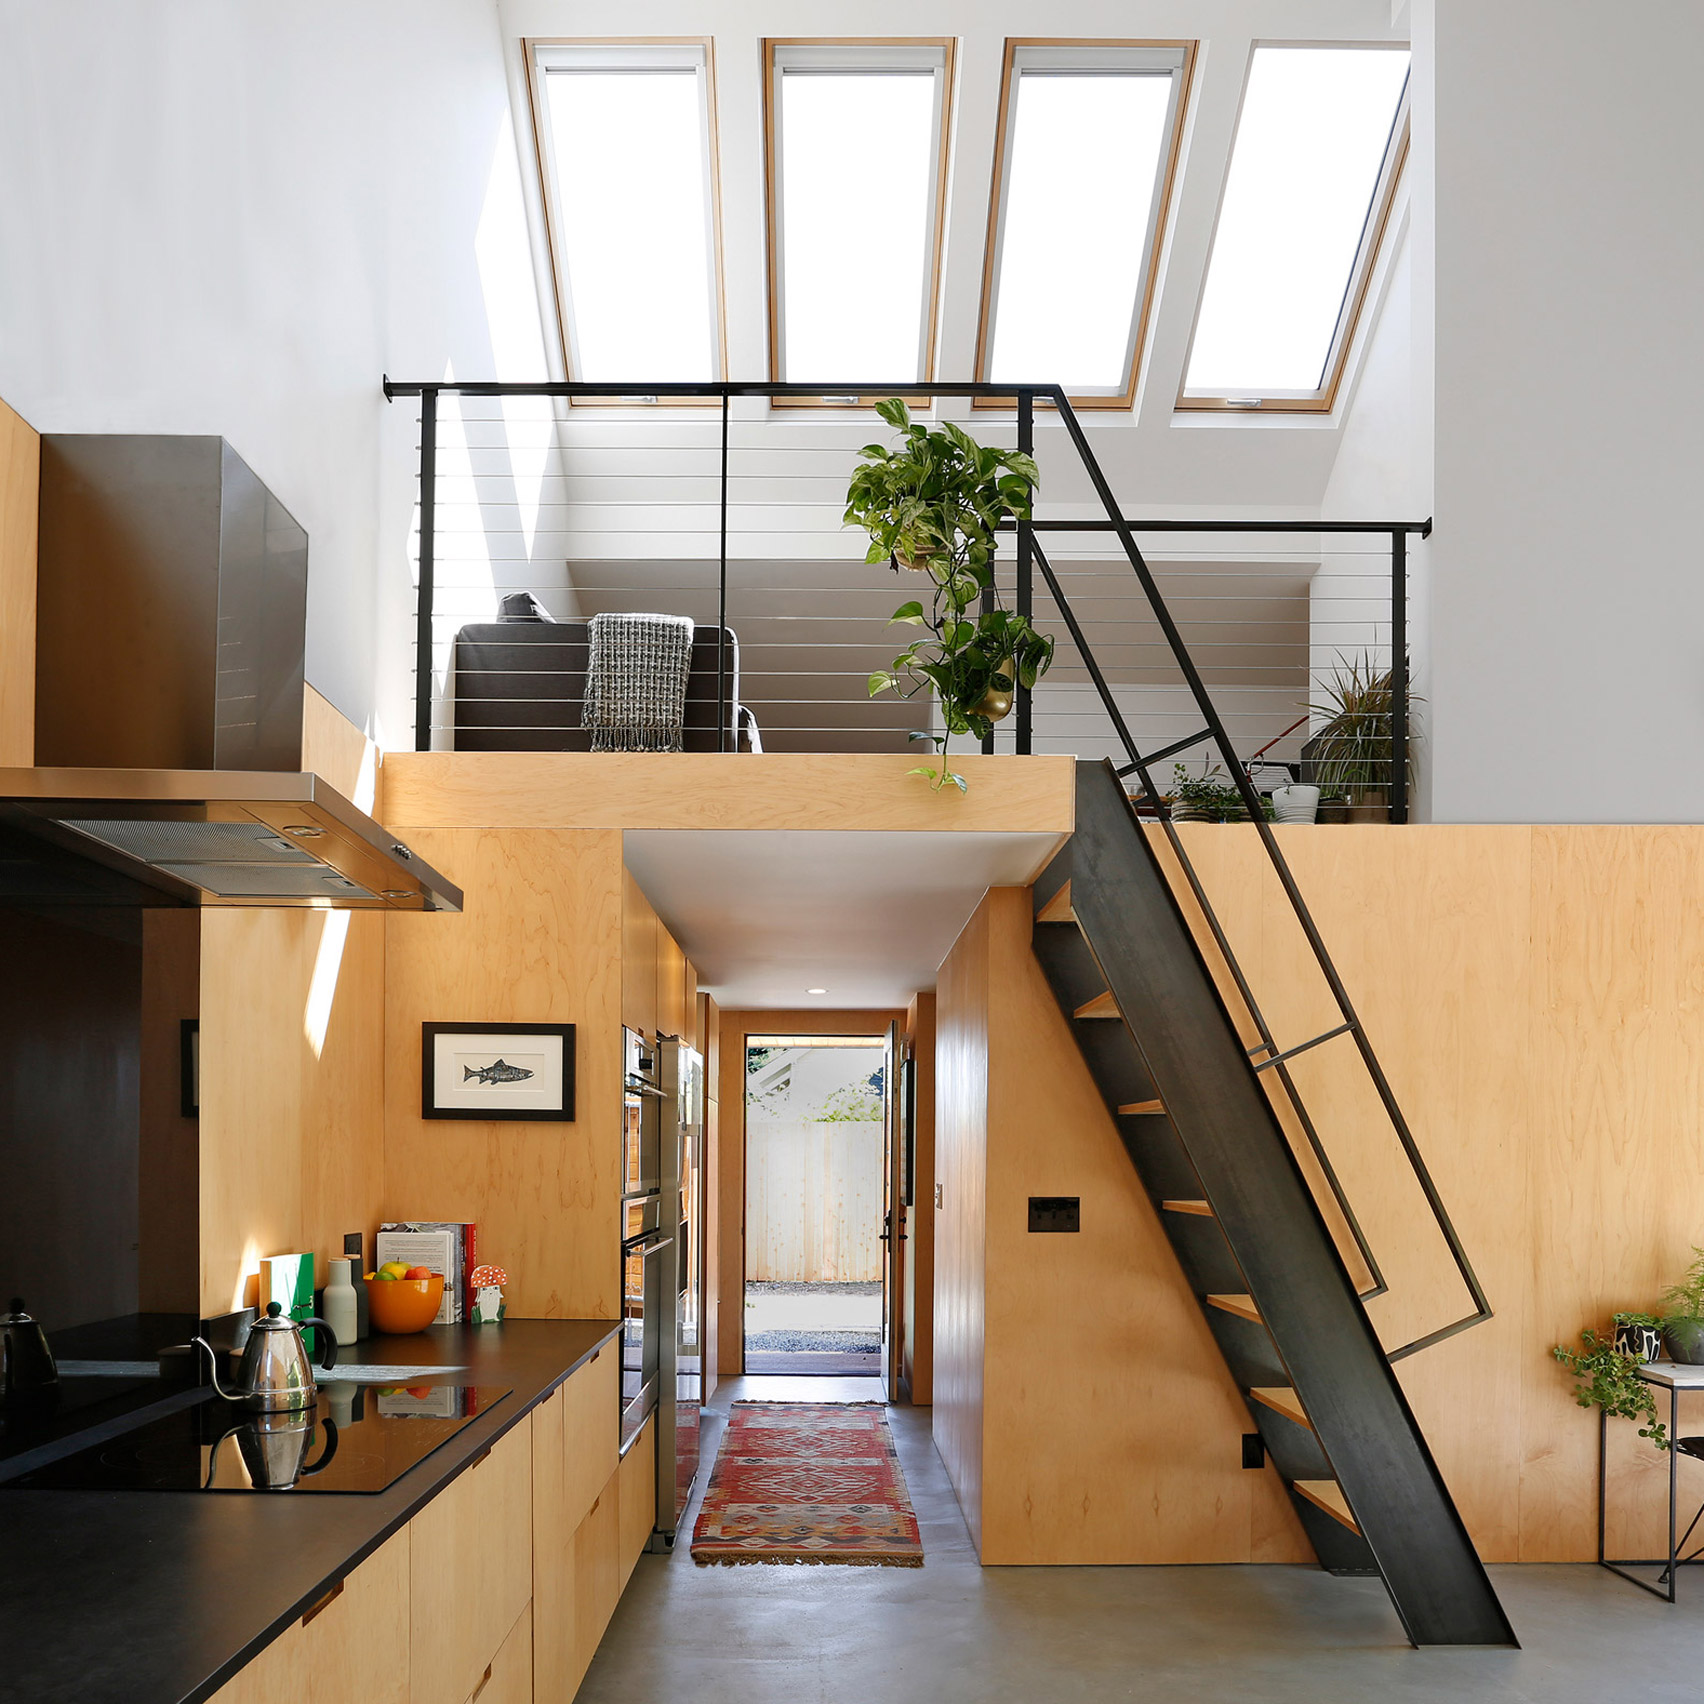 interior design jobs seattle entry level materials